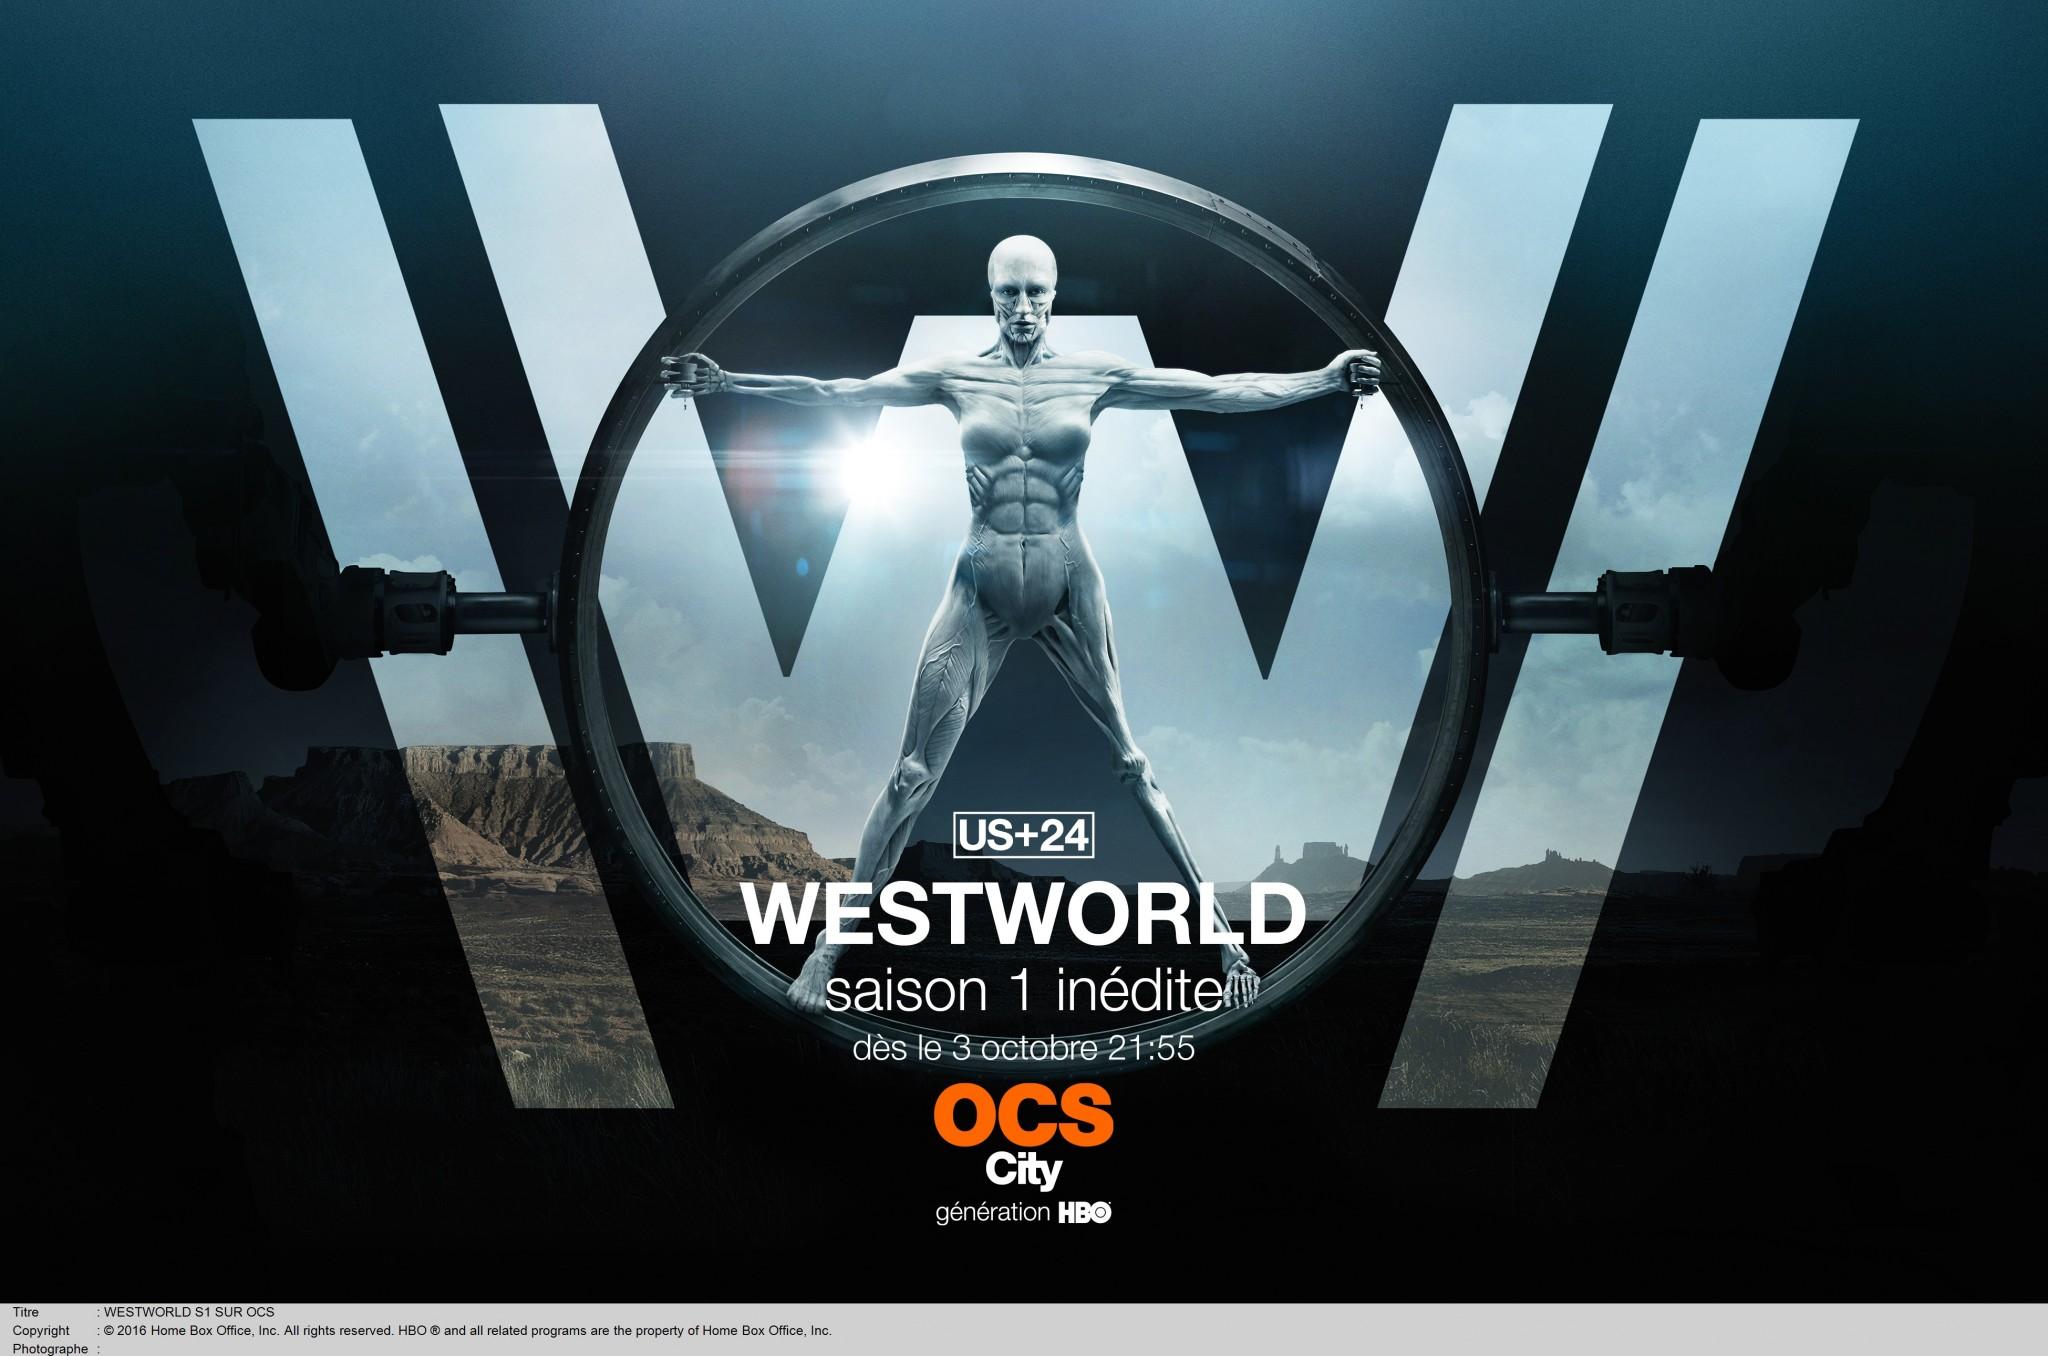 westworld-ocs